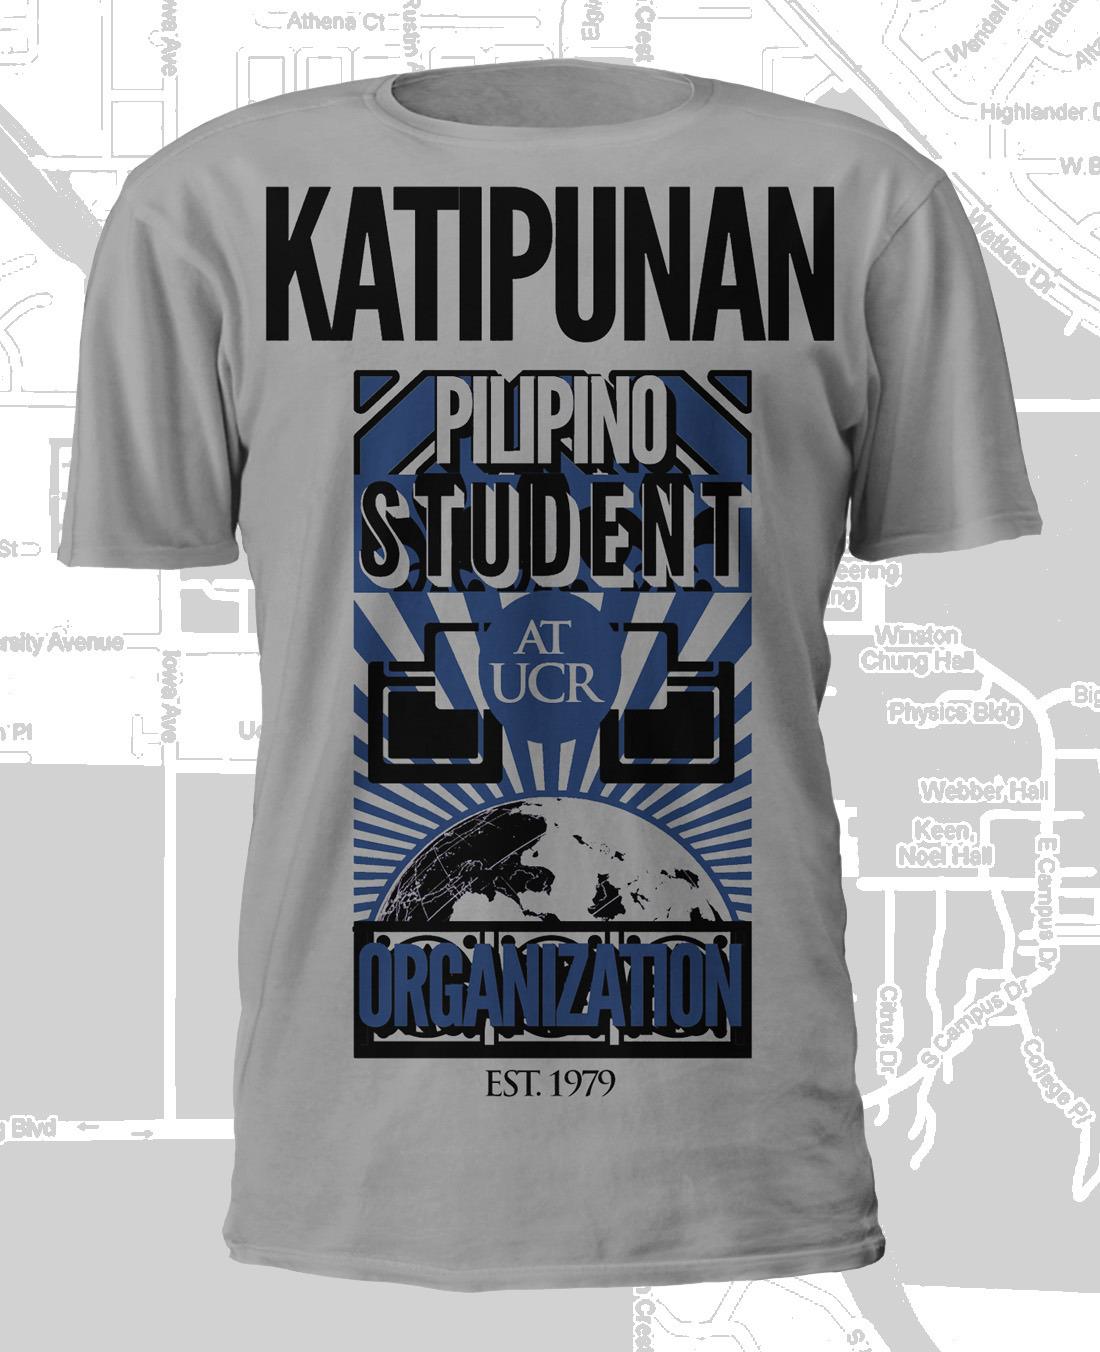 Design for Katipunan Pilipino Student Organization at UC Riverside (2011)